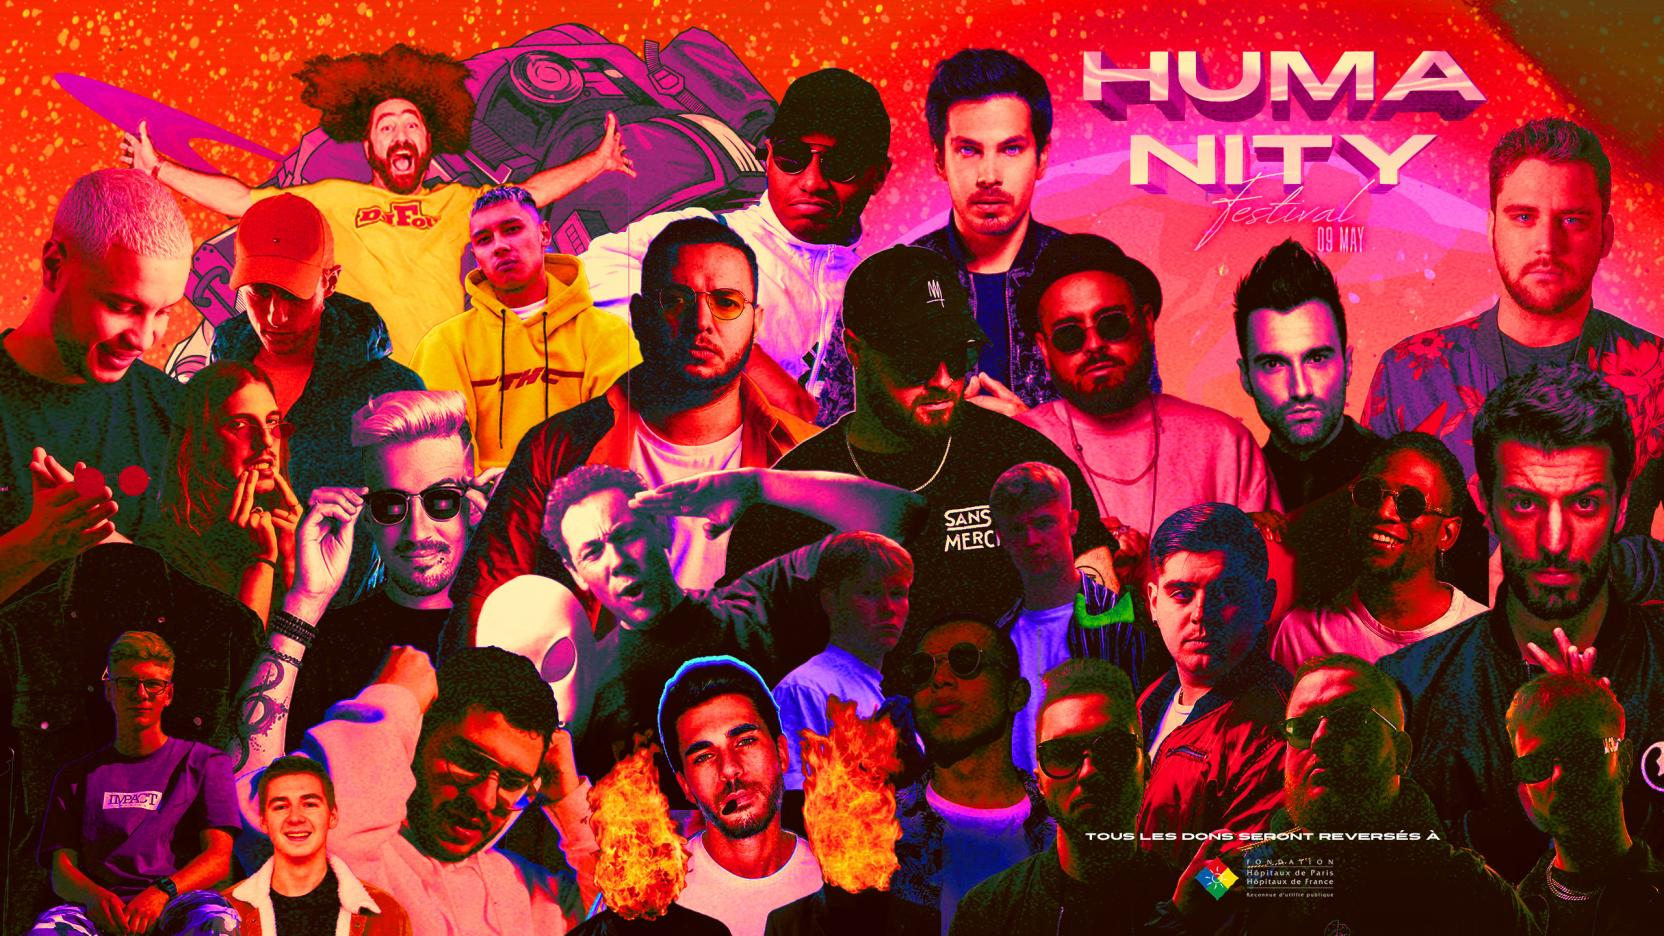 Humanity Festival Livestream